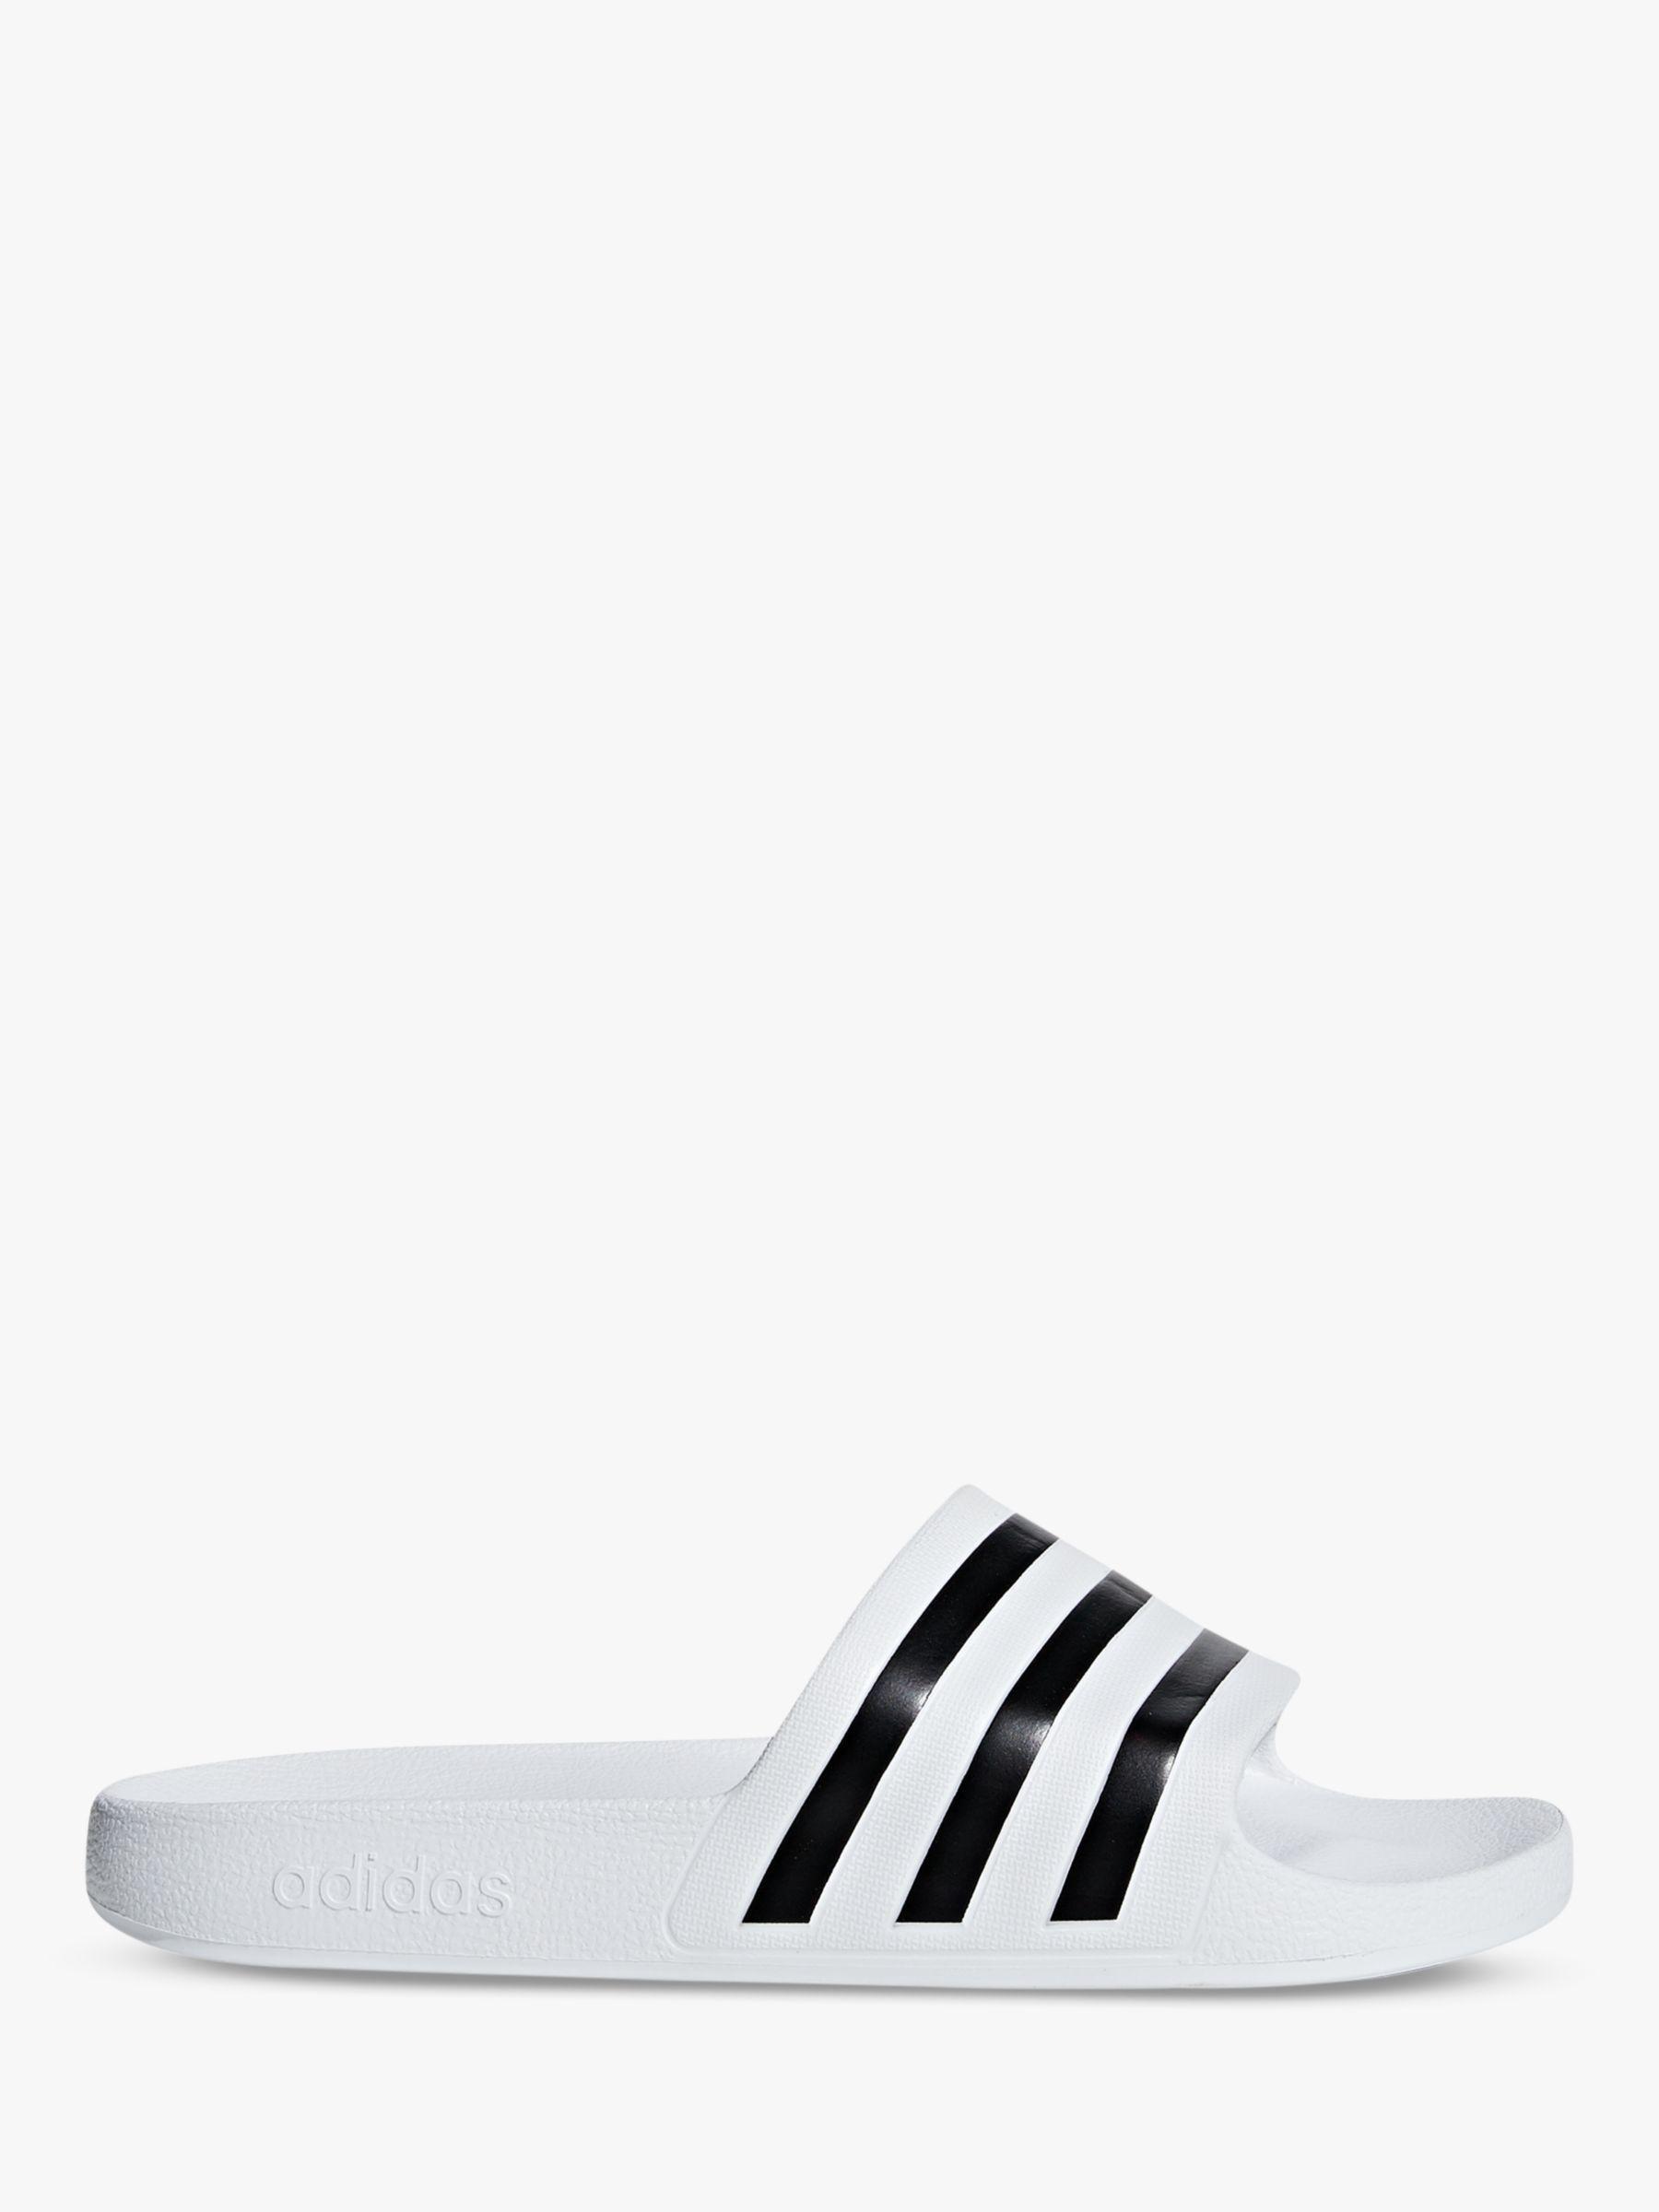 650e2219d Adidas - Black Adilette Aqua Women s Slides Slippers - Lyst. View fullscreen